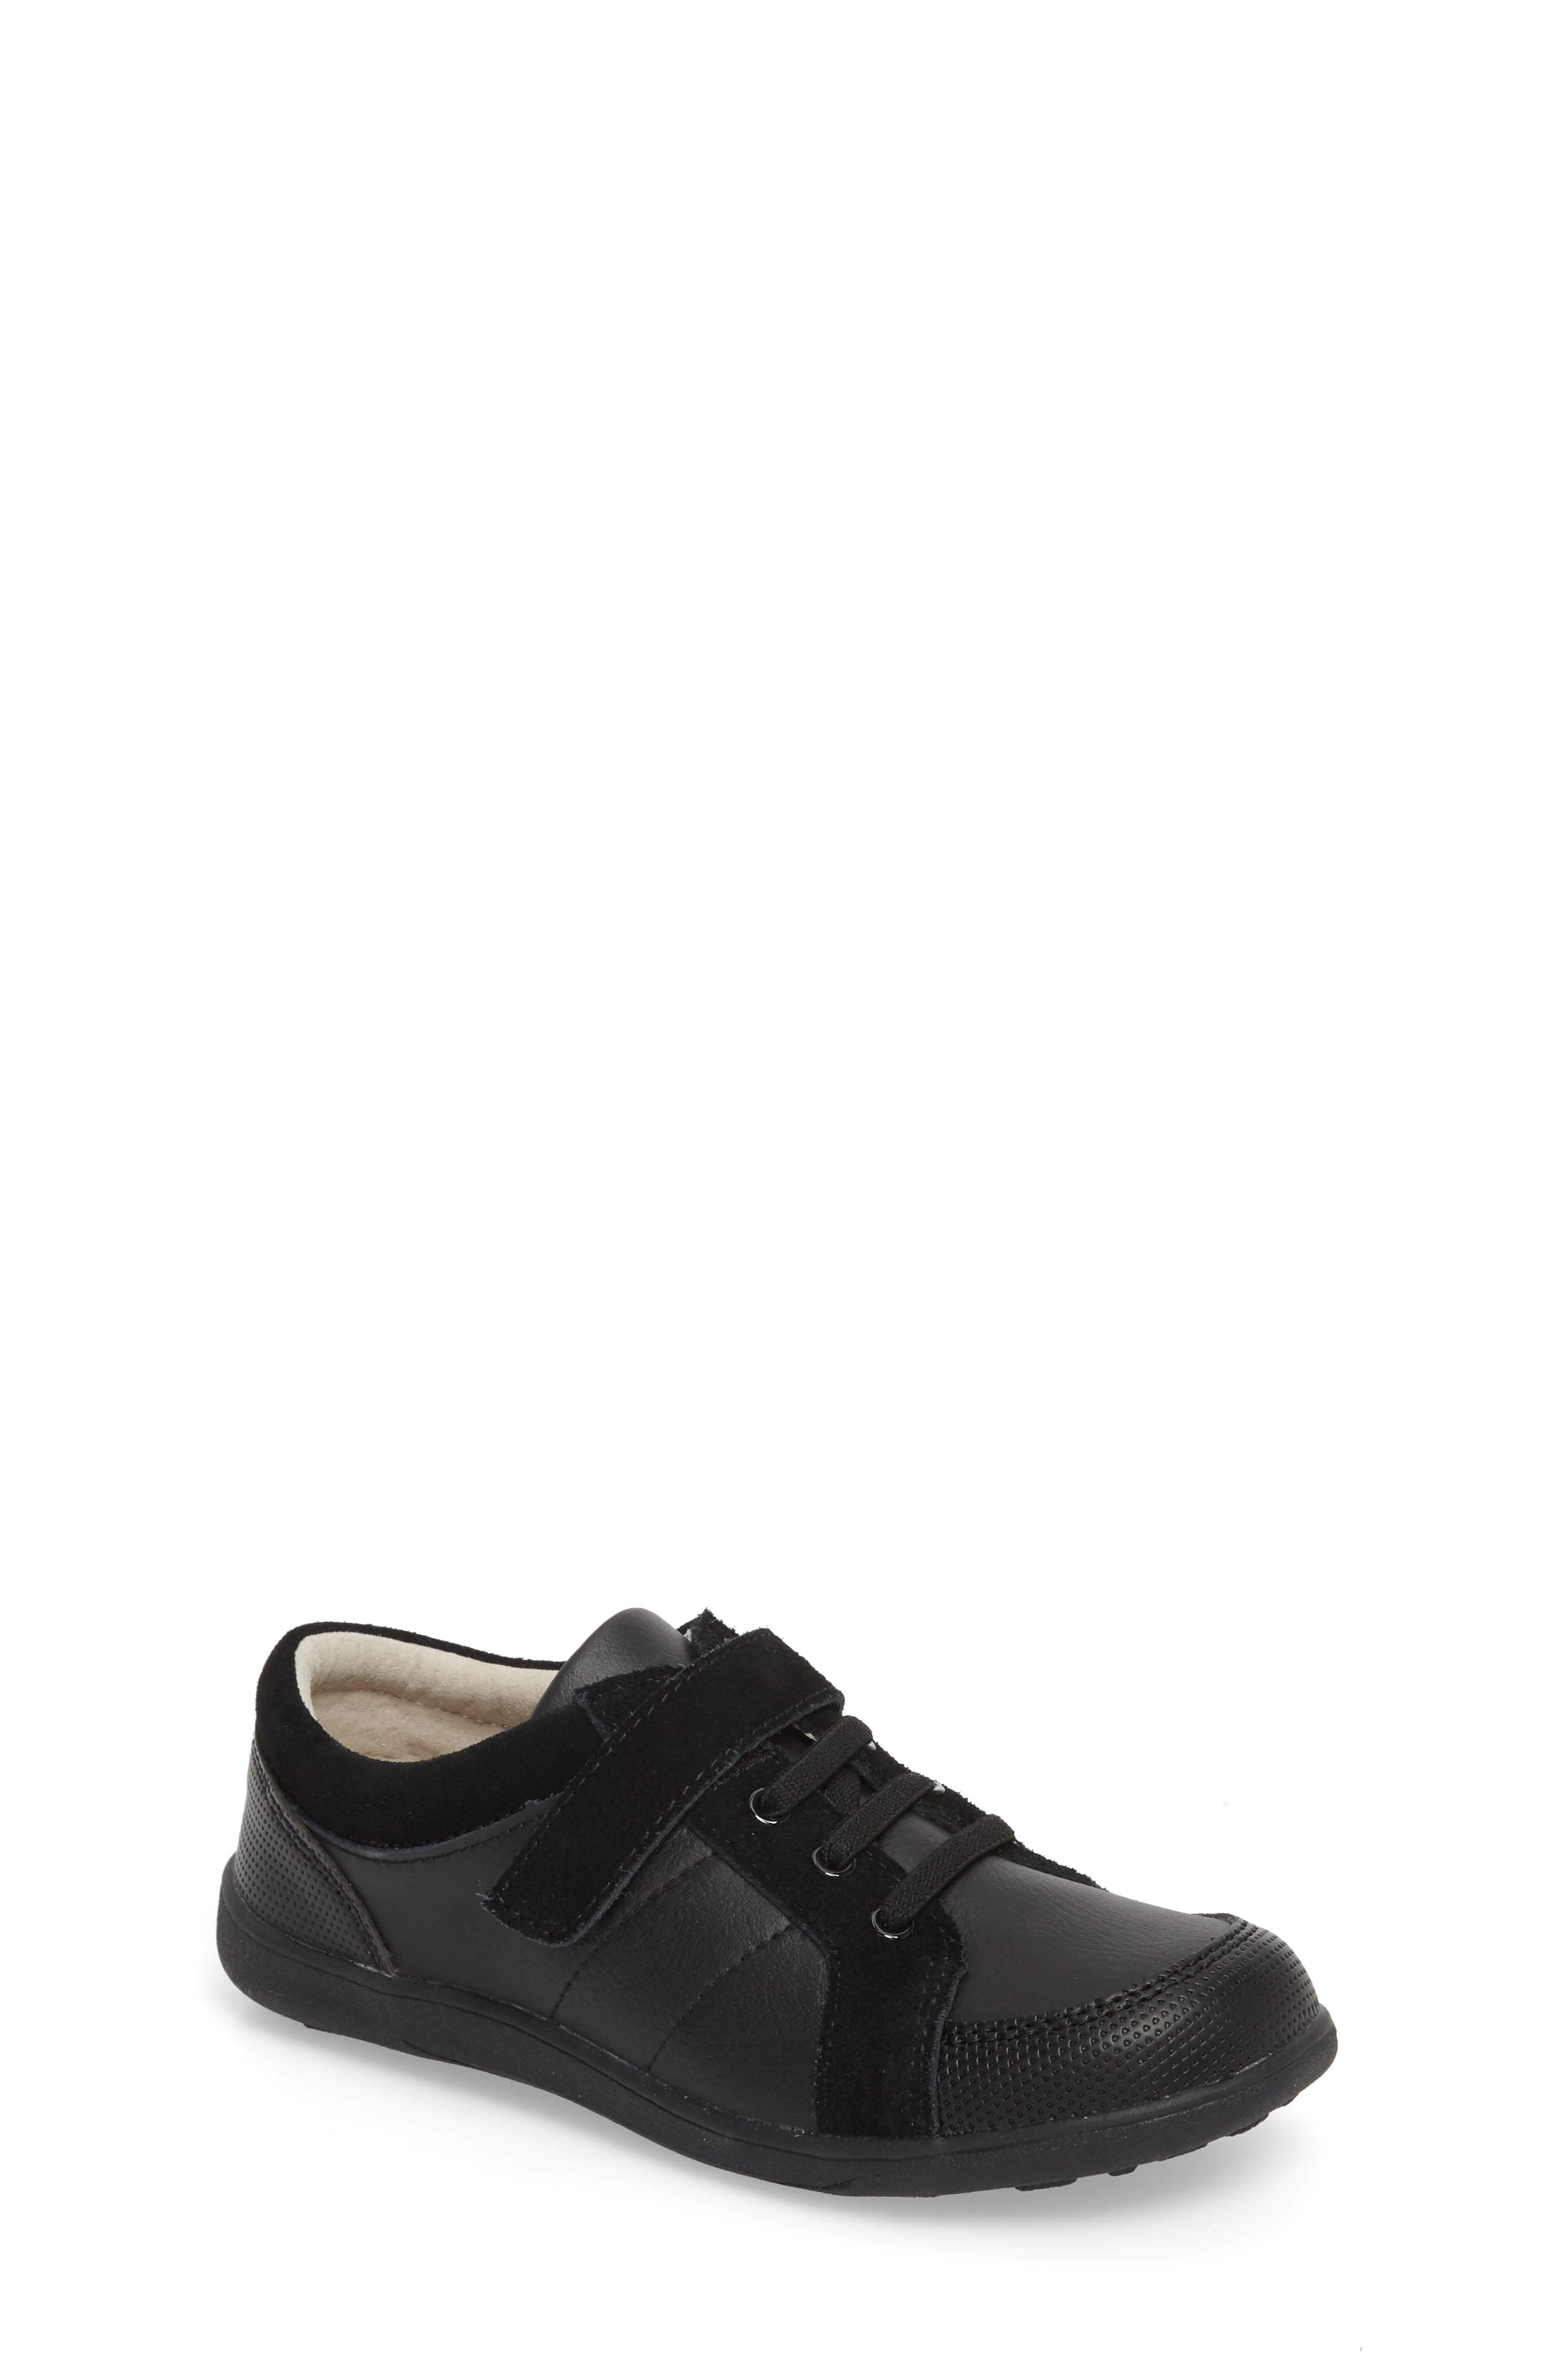 Randal III Sneaker,                         Main,                         color, Black